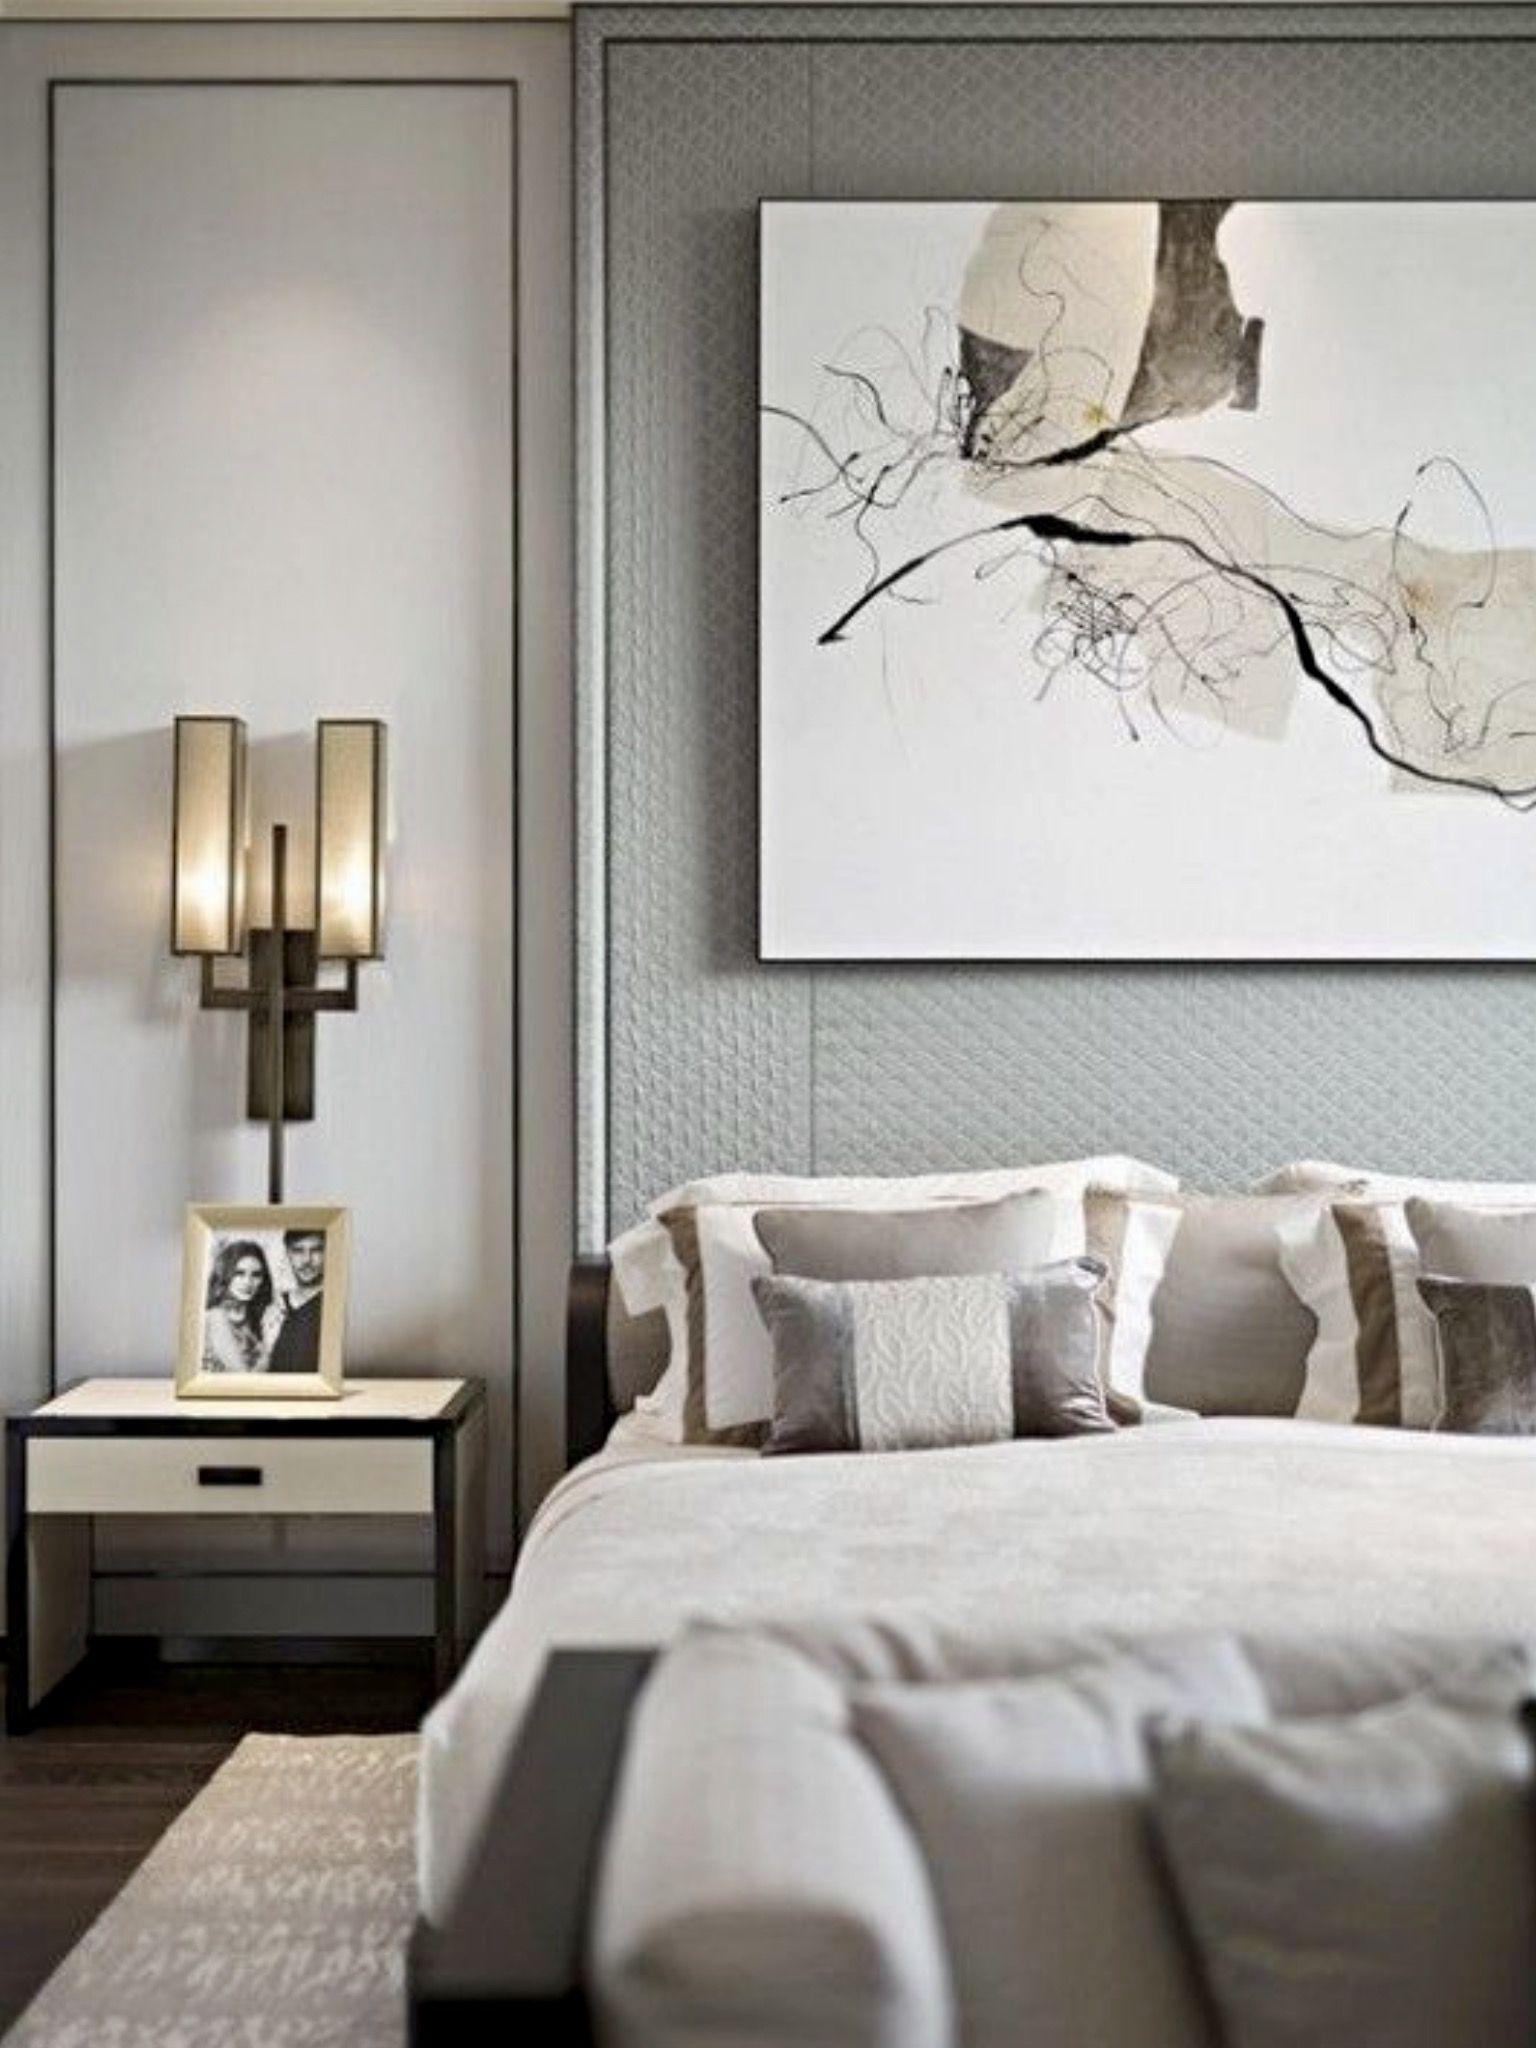 Modern contemporary master bedroom decor  GreyStyle Master Bedroom from Pinterest  Master bedroom Bedrooms